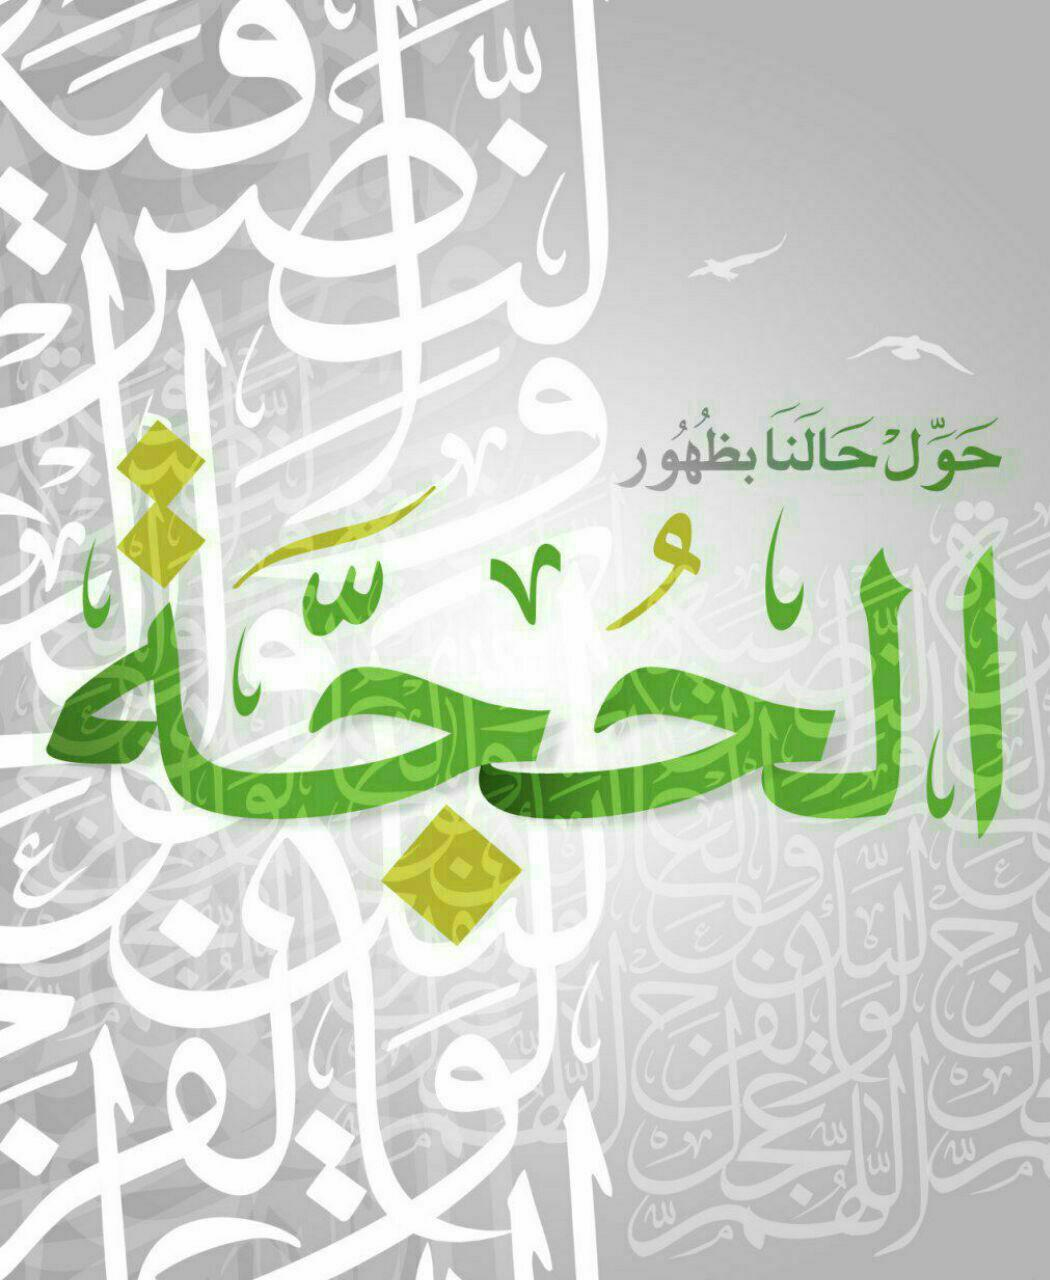 photo 2018 03 25 22 27 35 - دستورات امام زمان علیه السلام به سید رشتی